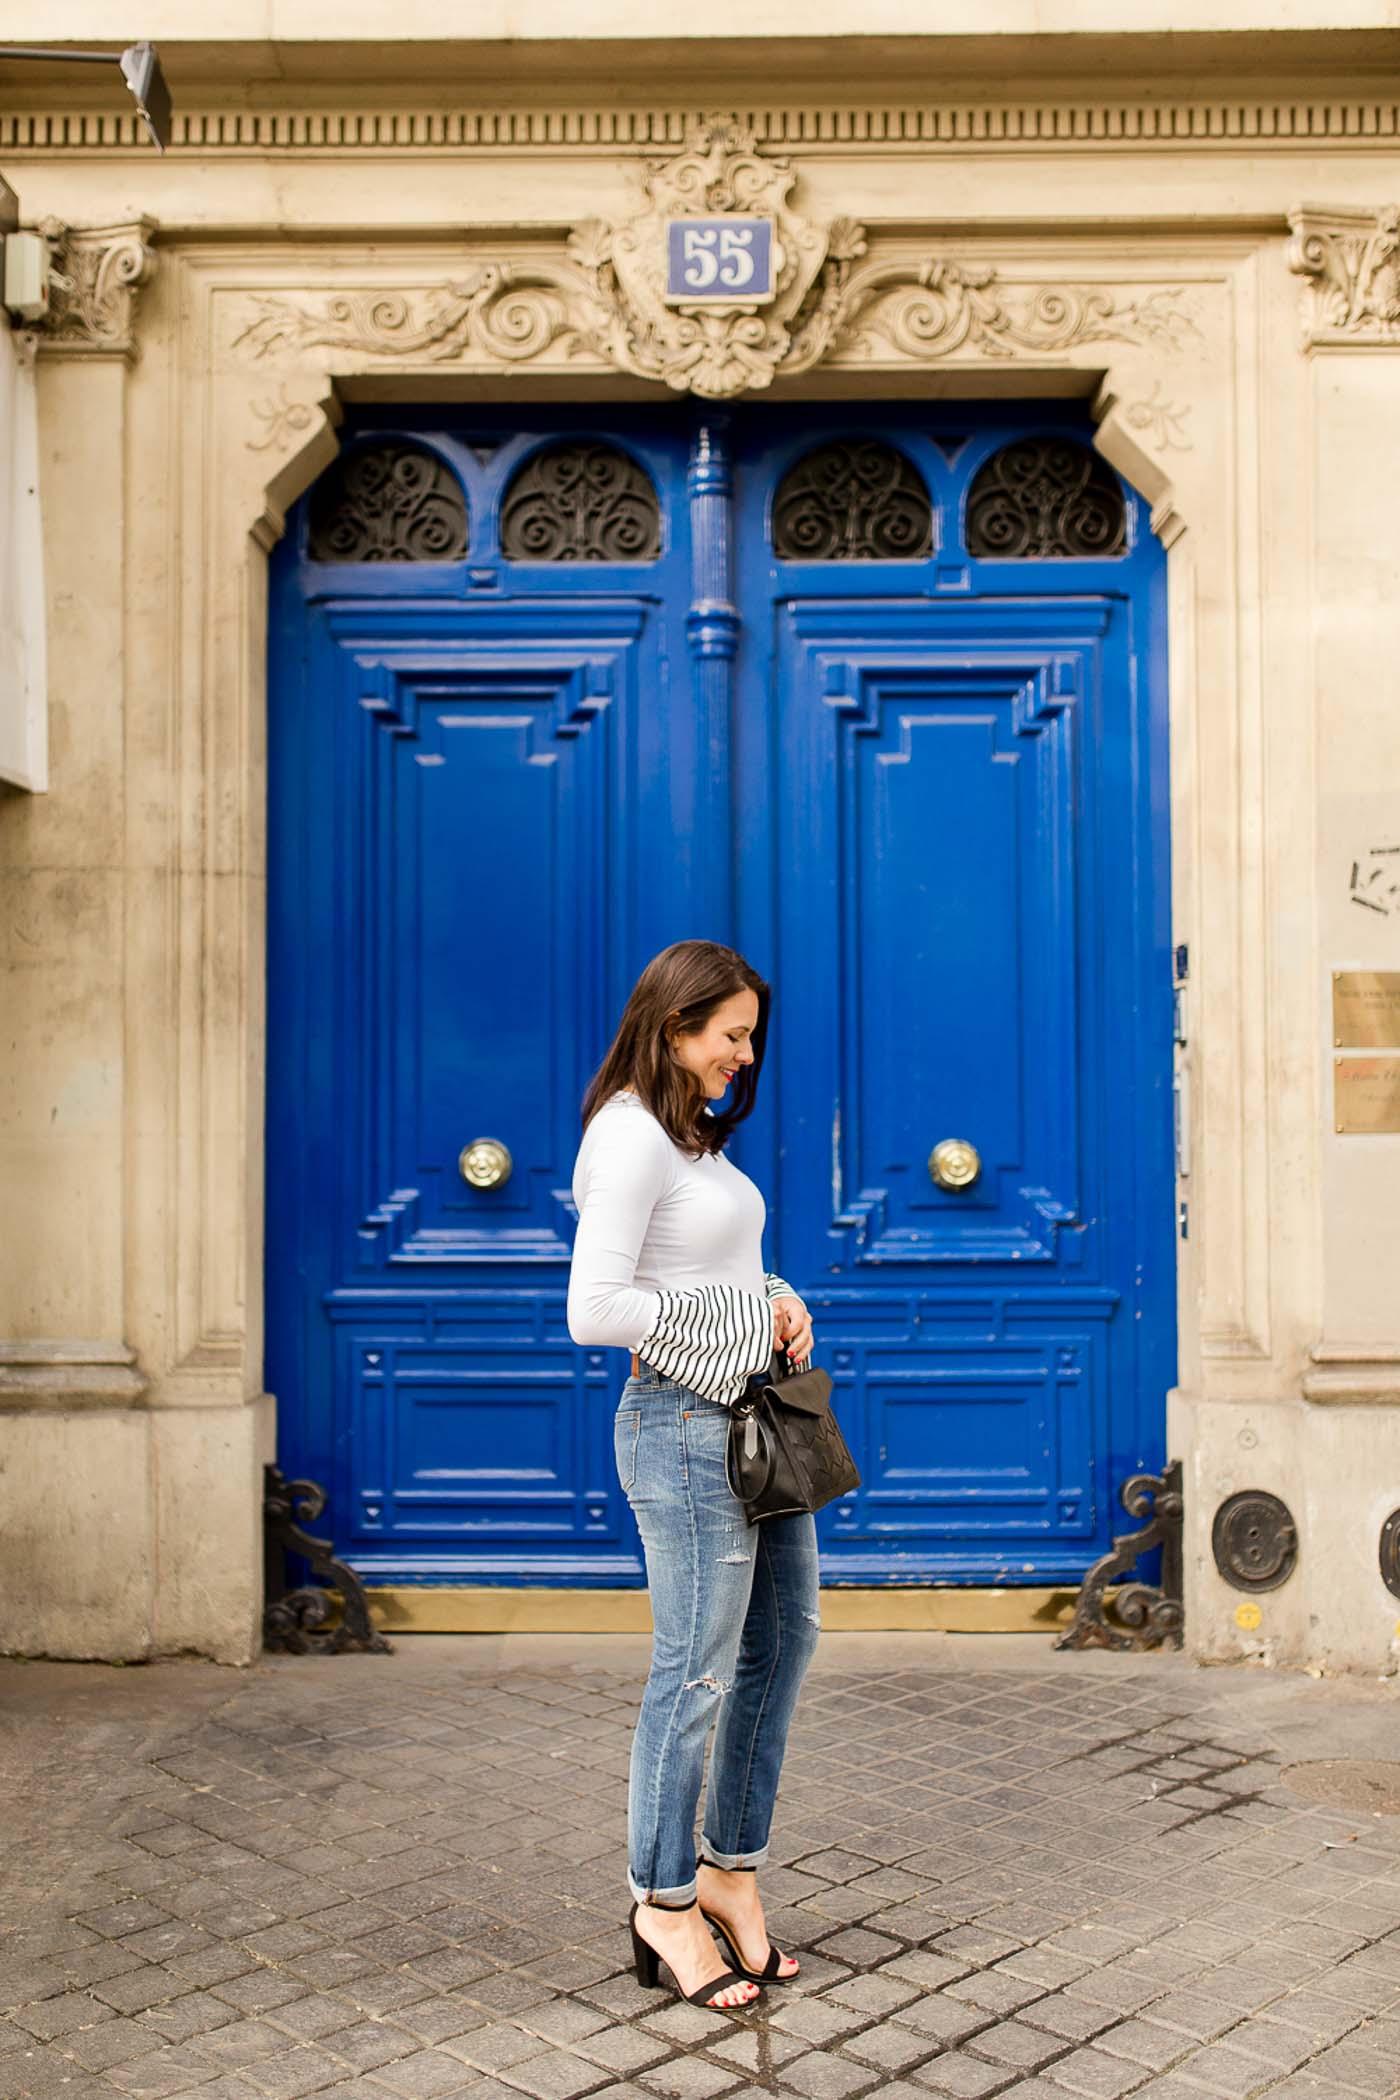 Paris Doors colorful doors outfit ideas paris photography u2013 My Style Vita @mystylevita & Paris Doors colorful doors outfit ideas paris photography - My ...